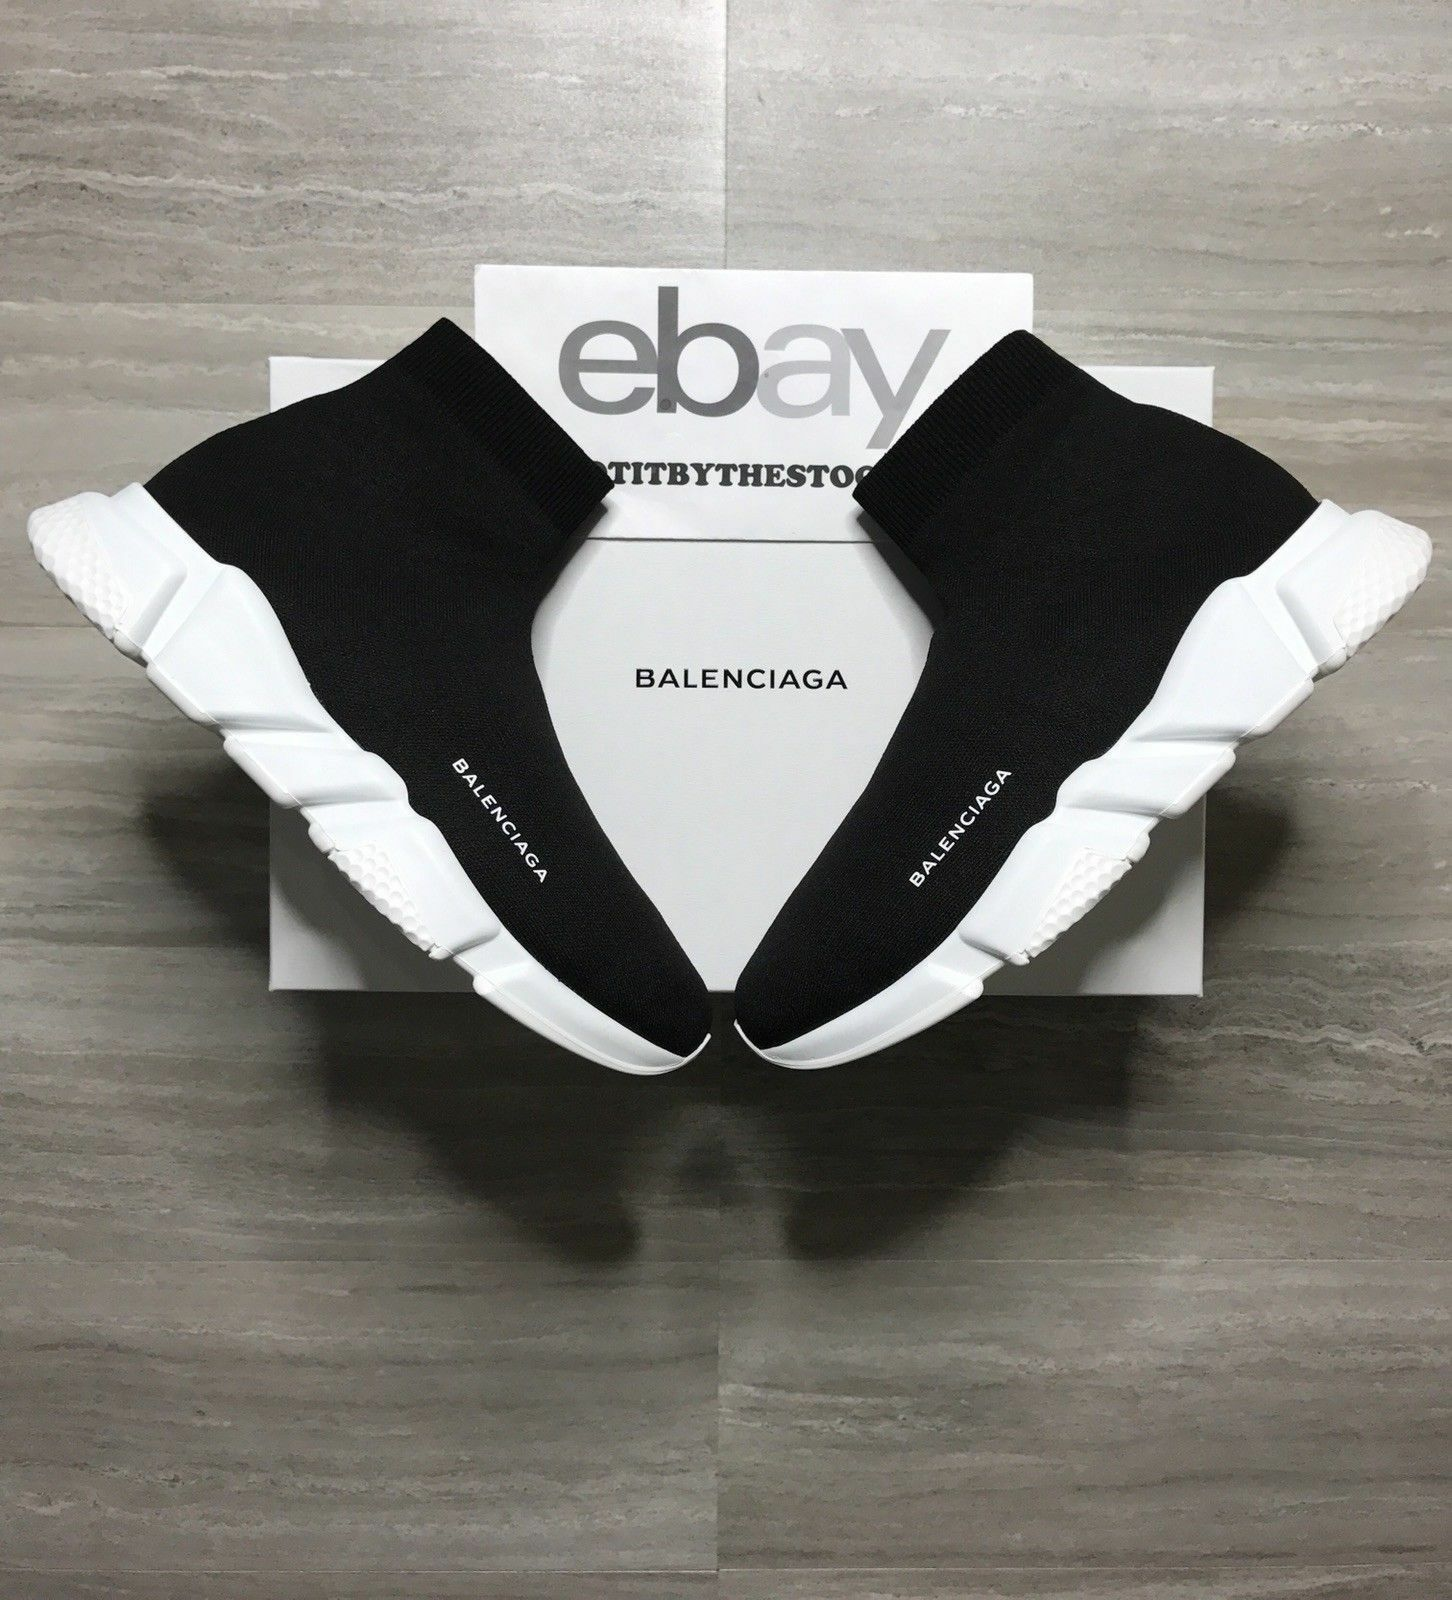 BALENCIAGA SPEED TRAINER BLACK WHITE OG VETEMENTS eBay